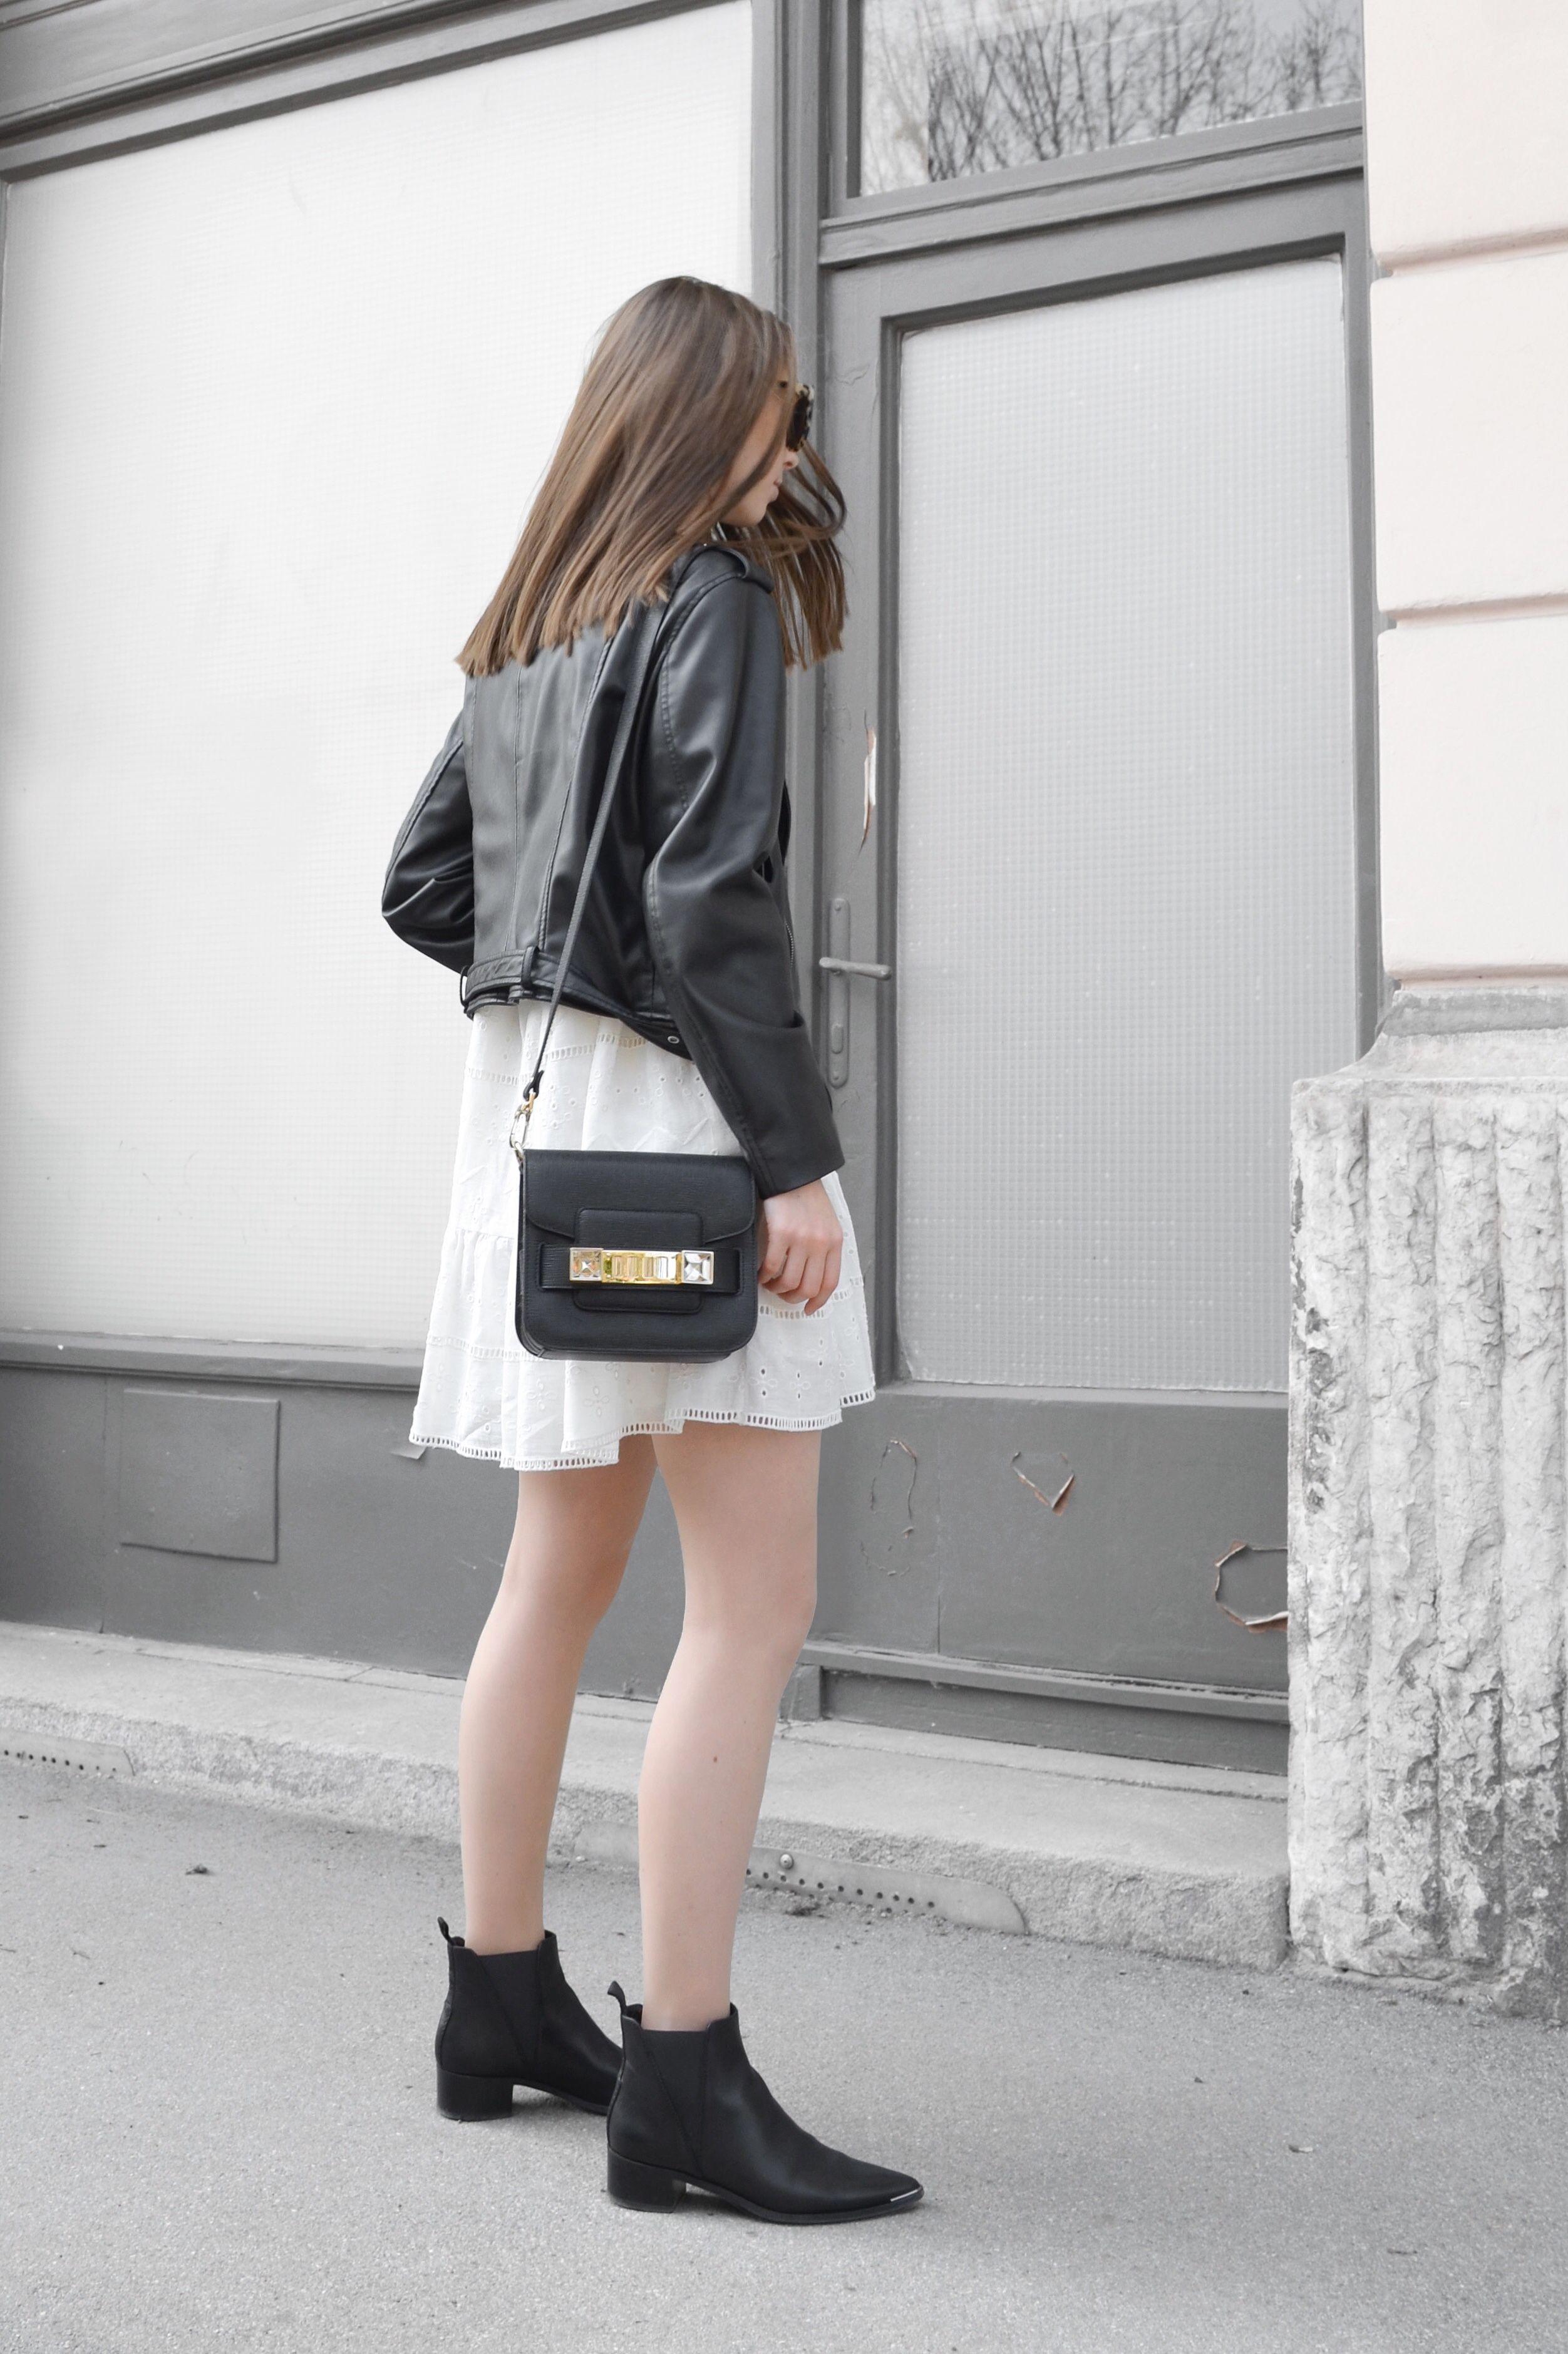 White lace dress zara  Black Leather u White Lace wearing Zara Dress  Zara Leather Jacket